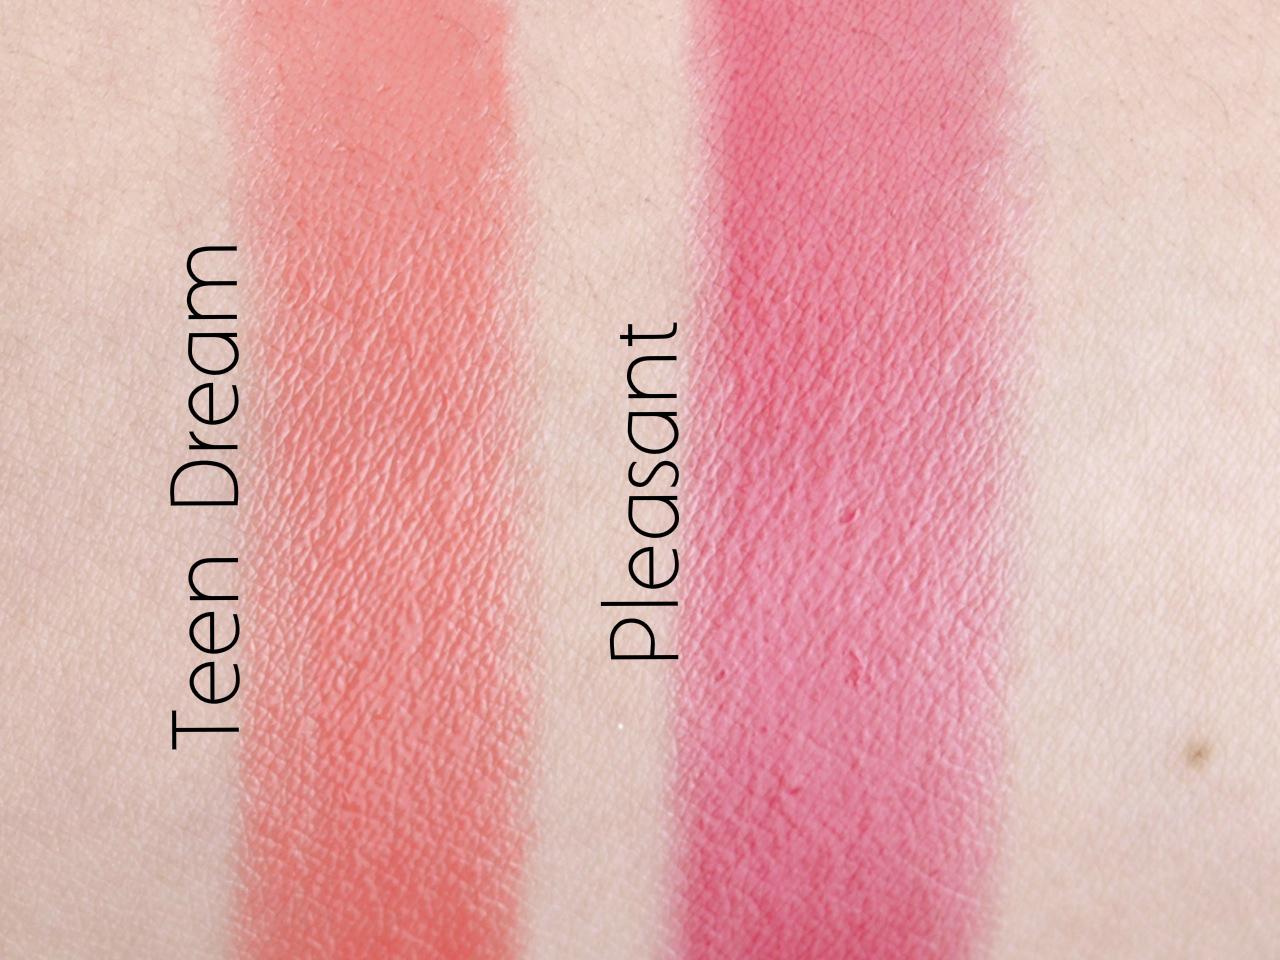 Mac Patentpolish Lip Pencil In Teen Dream Pleasant